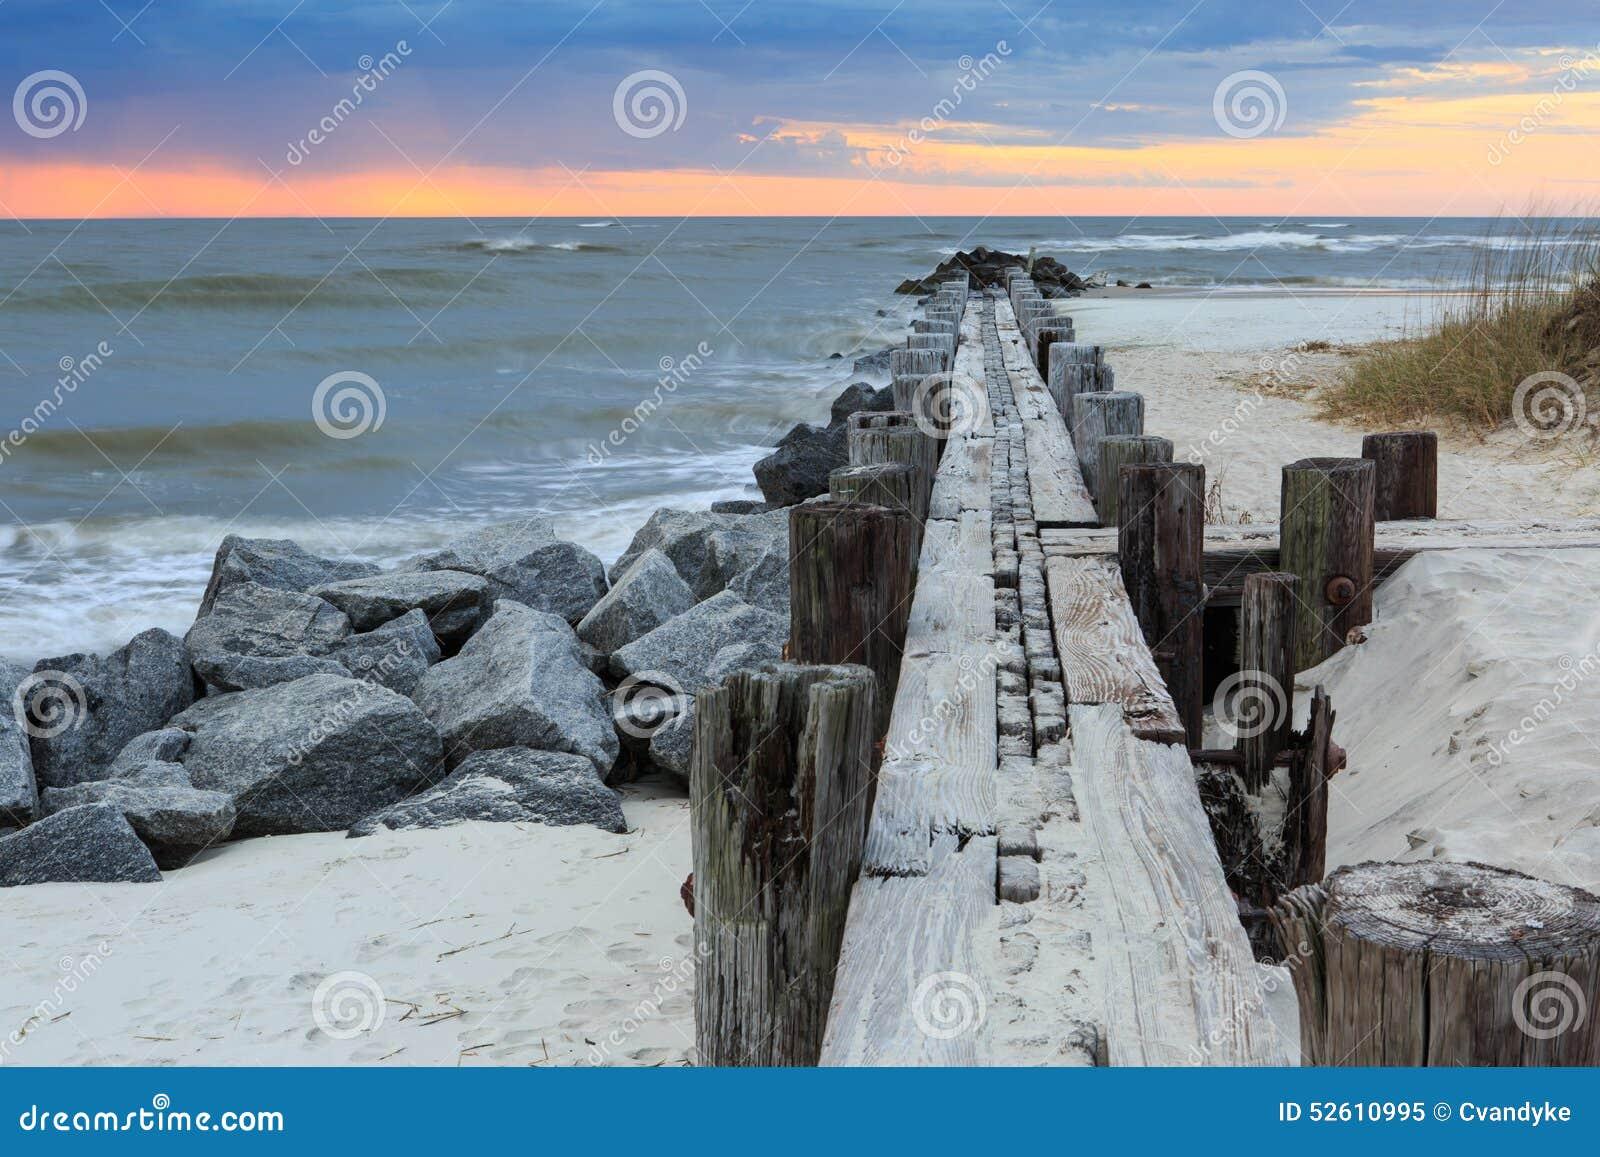 Folly beach soil erosion stock photo image 52610995 for South carolina soil